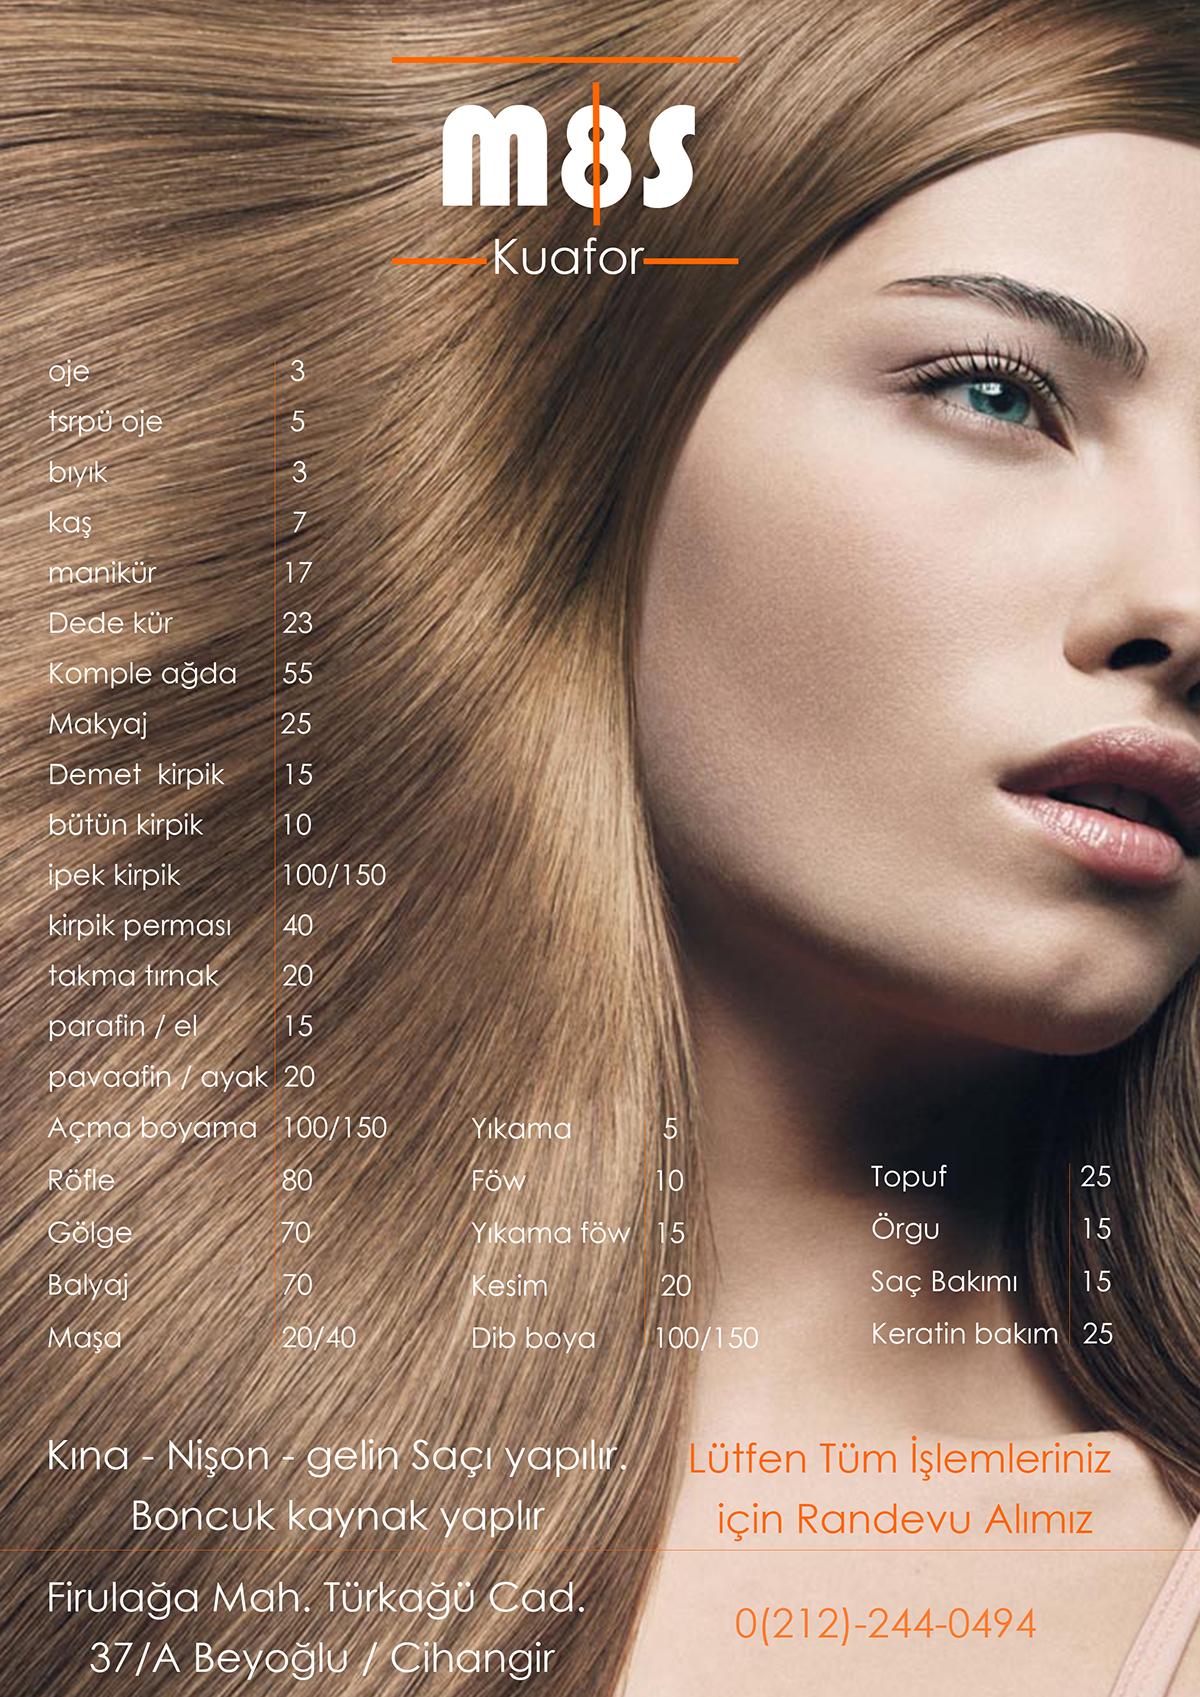 kuaför hair hairstyles